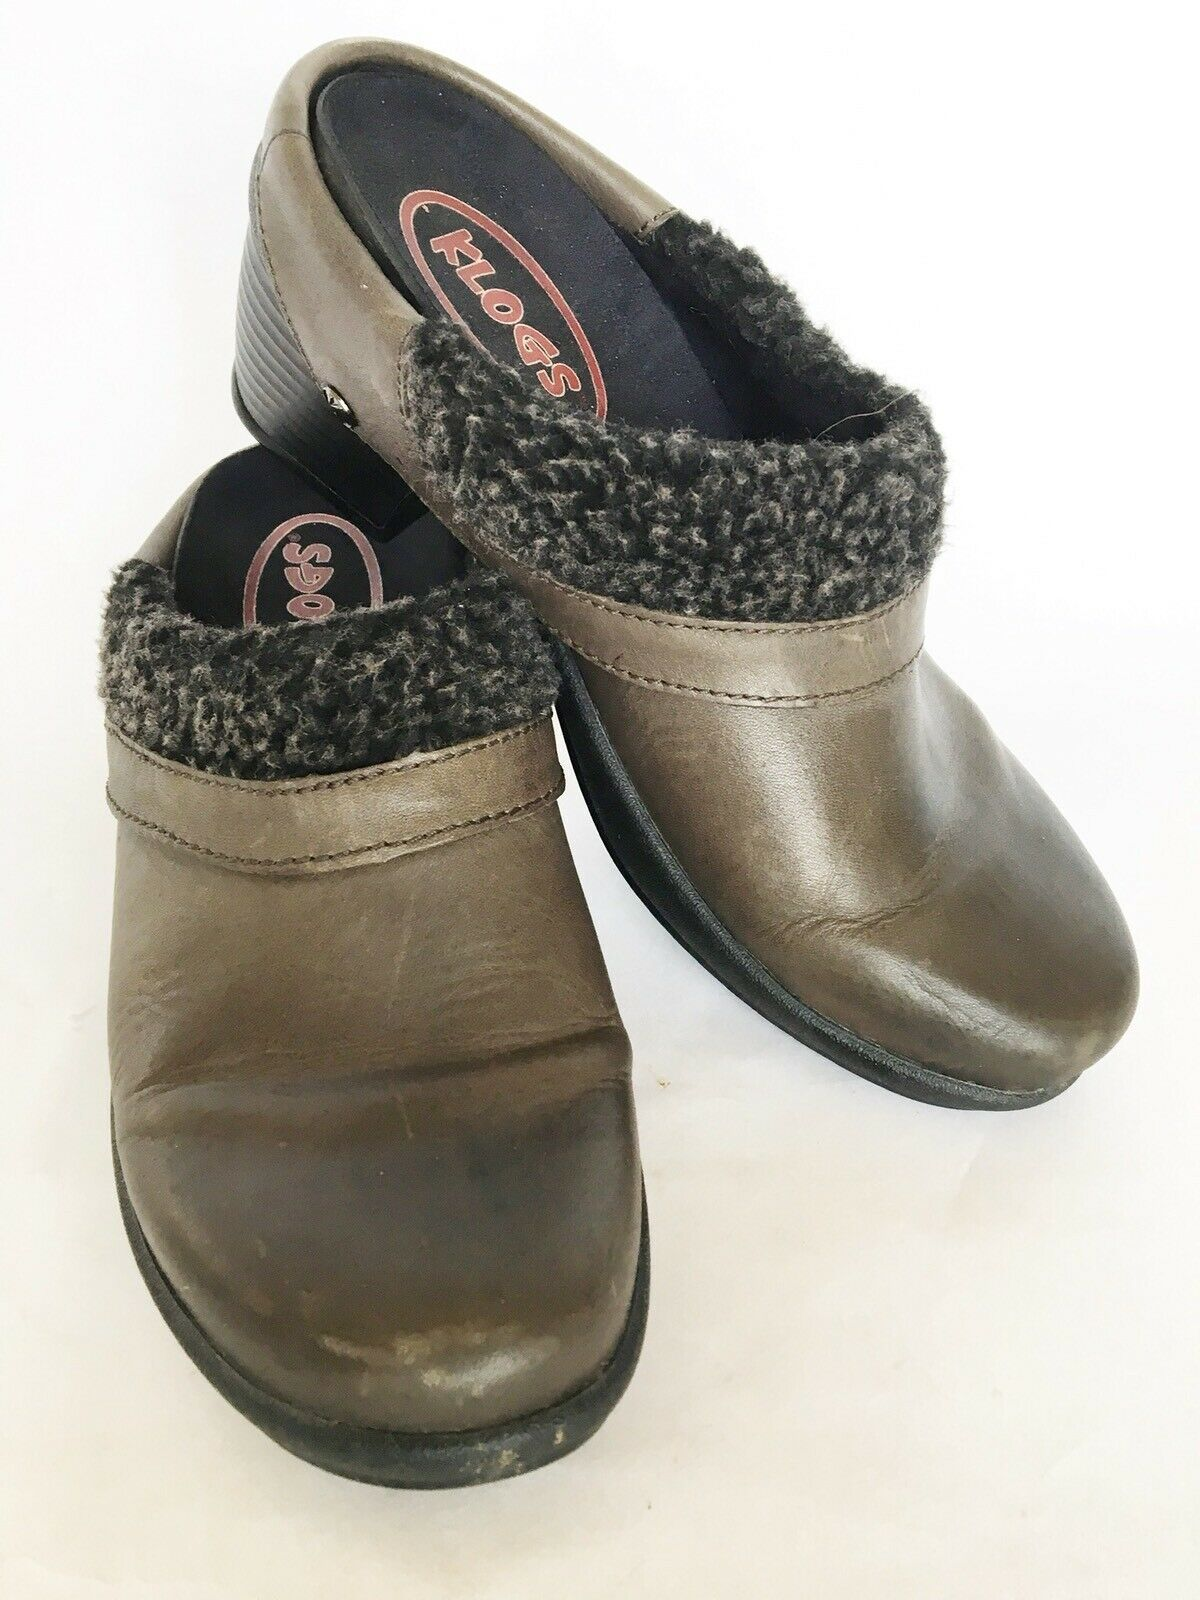 Klogs Brown Size 9 Comfort Open Back Clogs Women's Shoe Faux Fur Fabric Lined